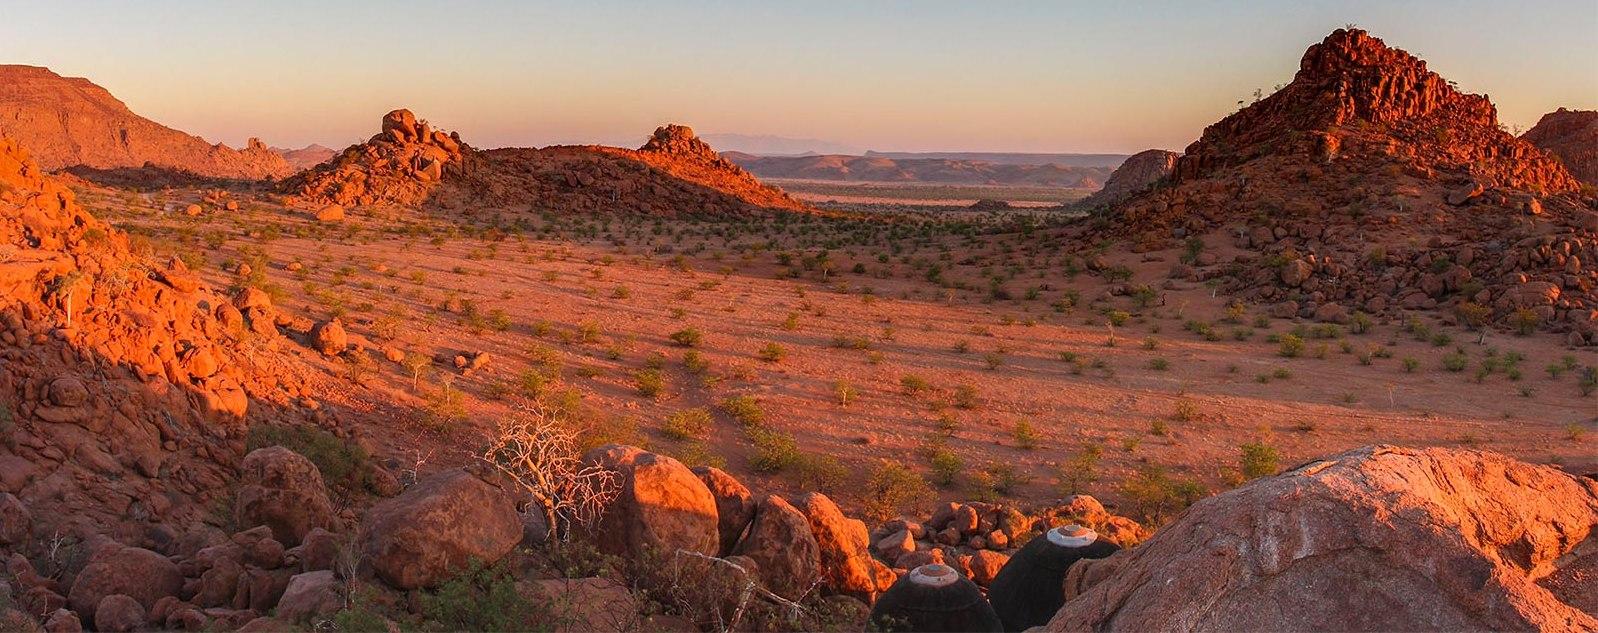 damaraland-namibia-panorama